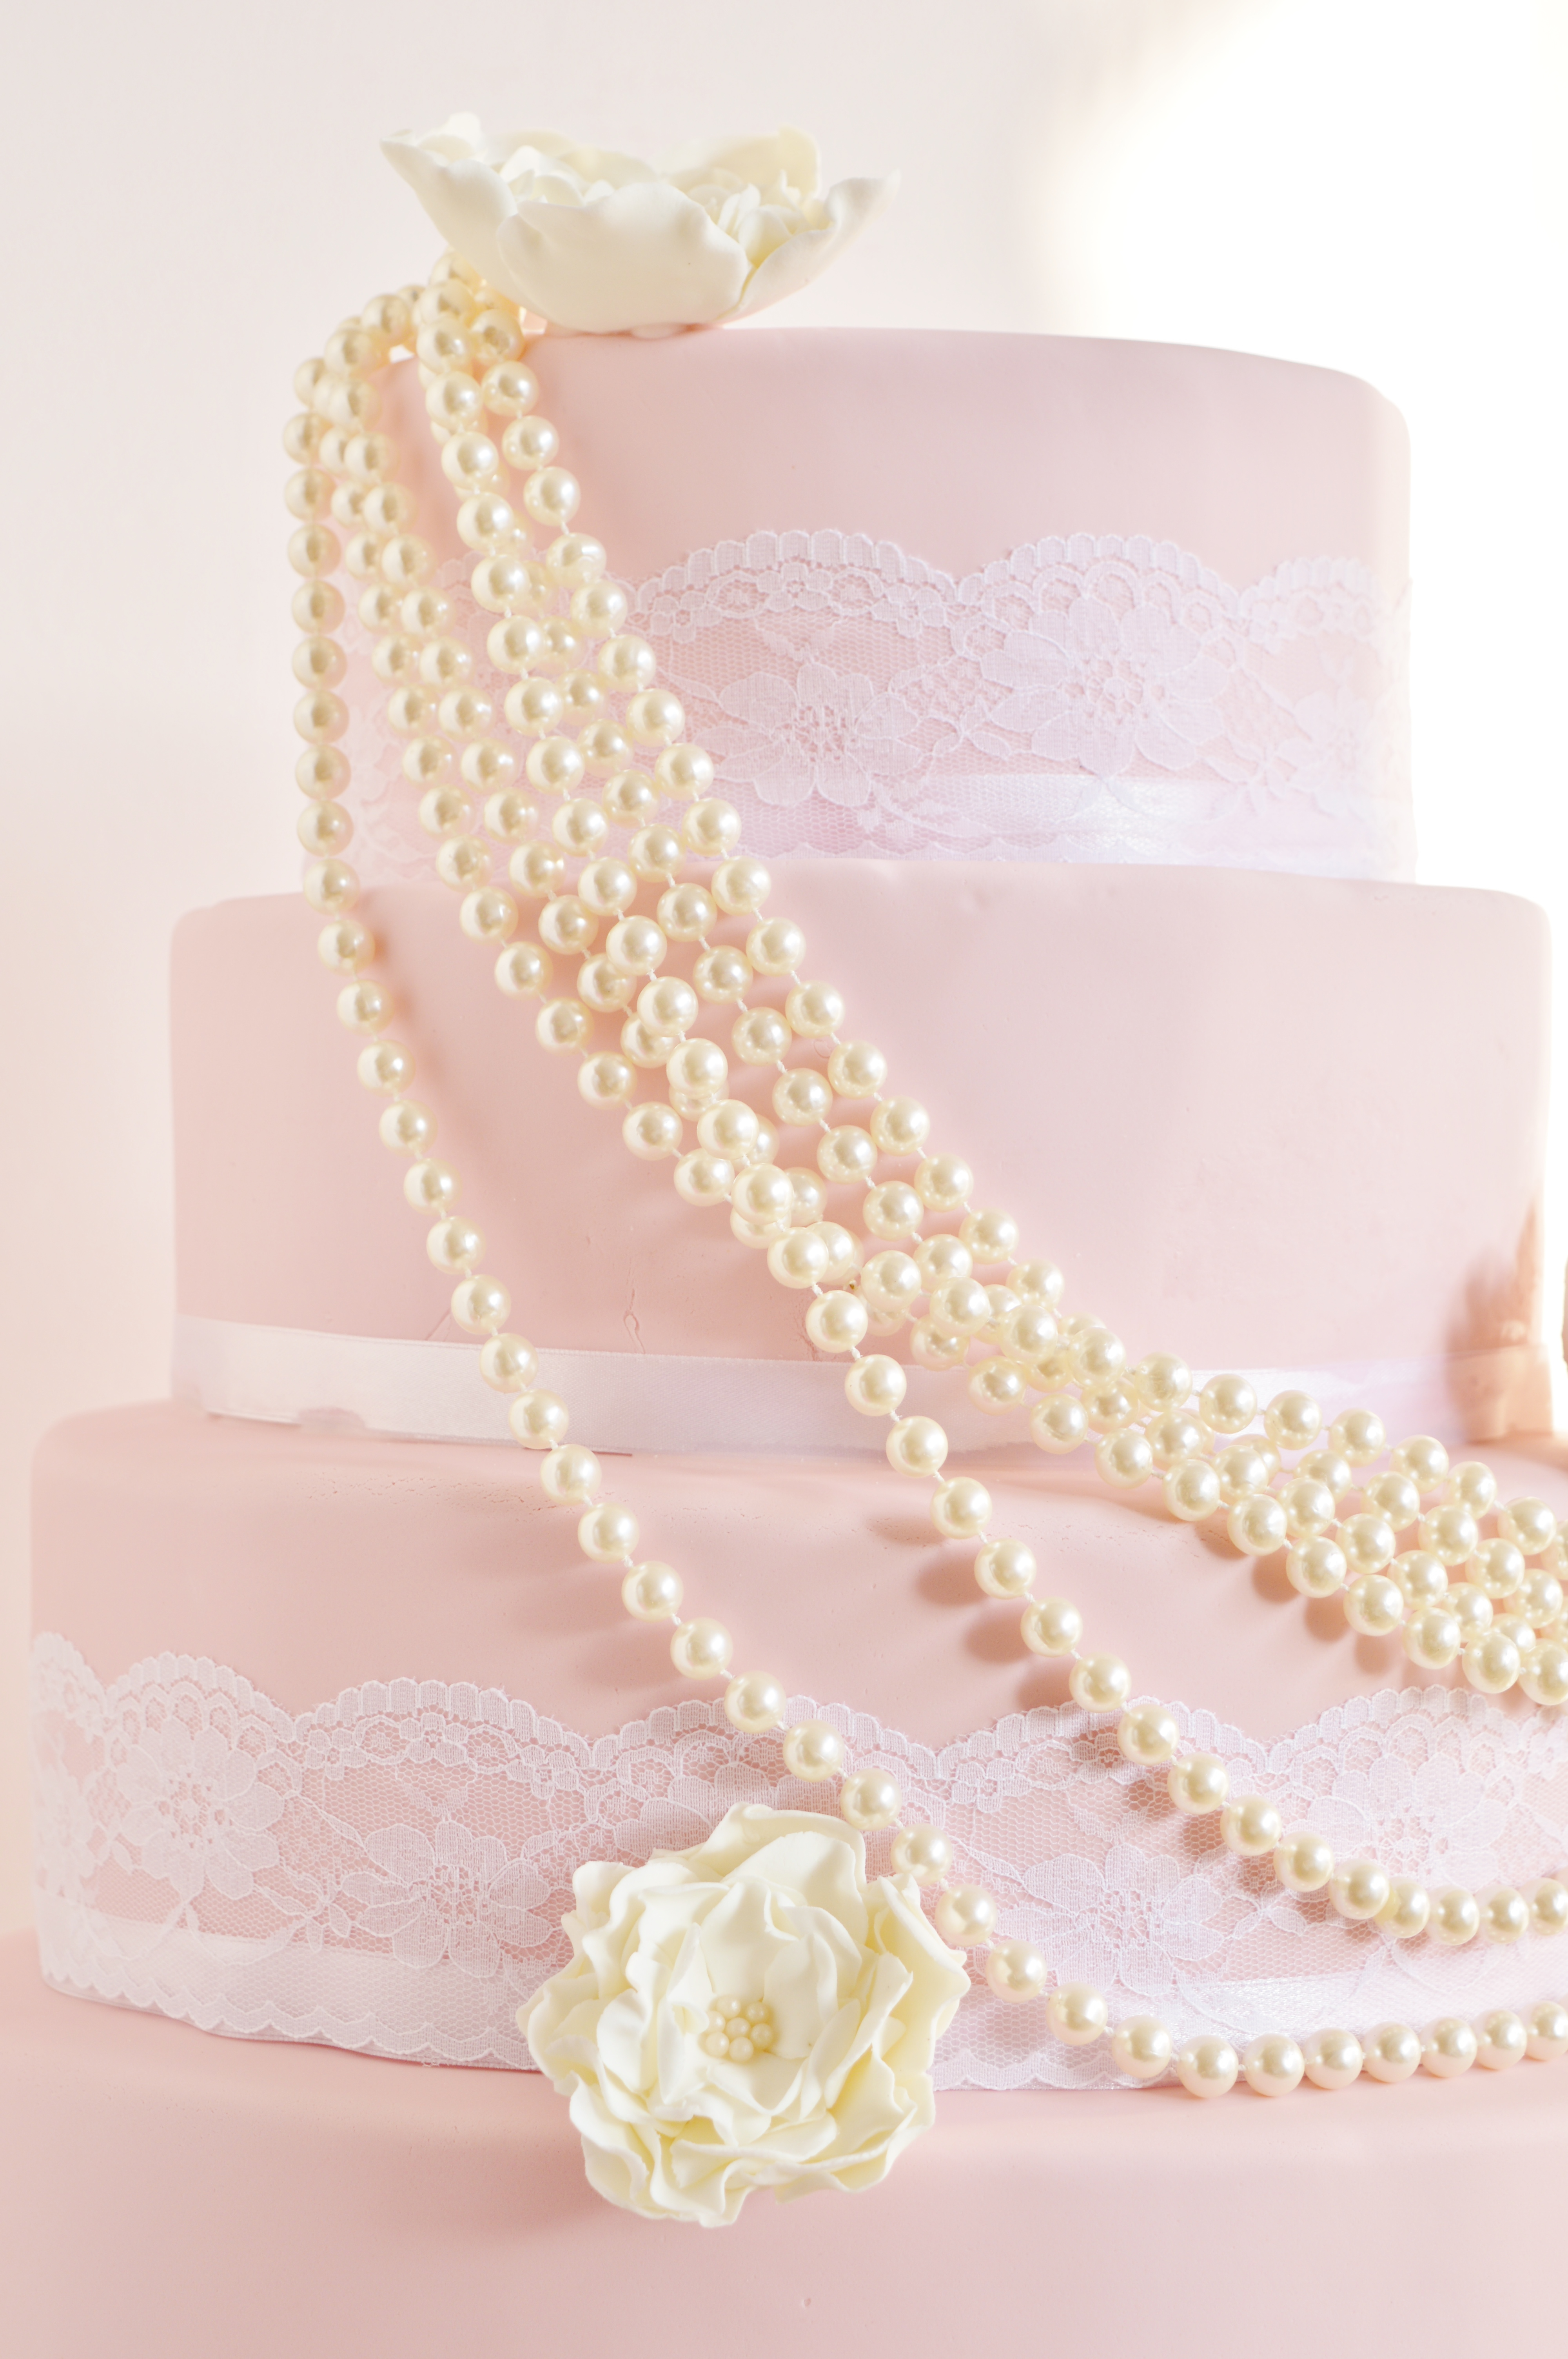 wedding cake pearls & lace order Den Haag, Roze trouwentaart